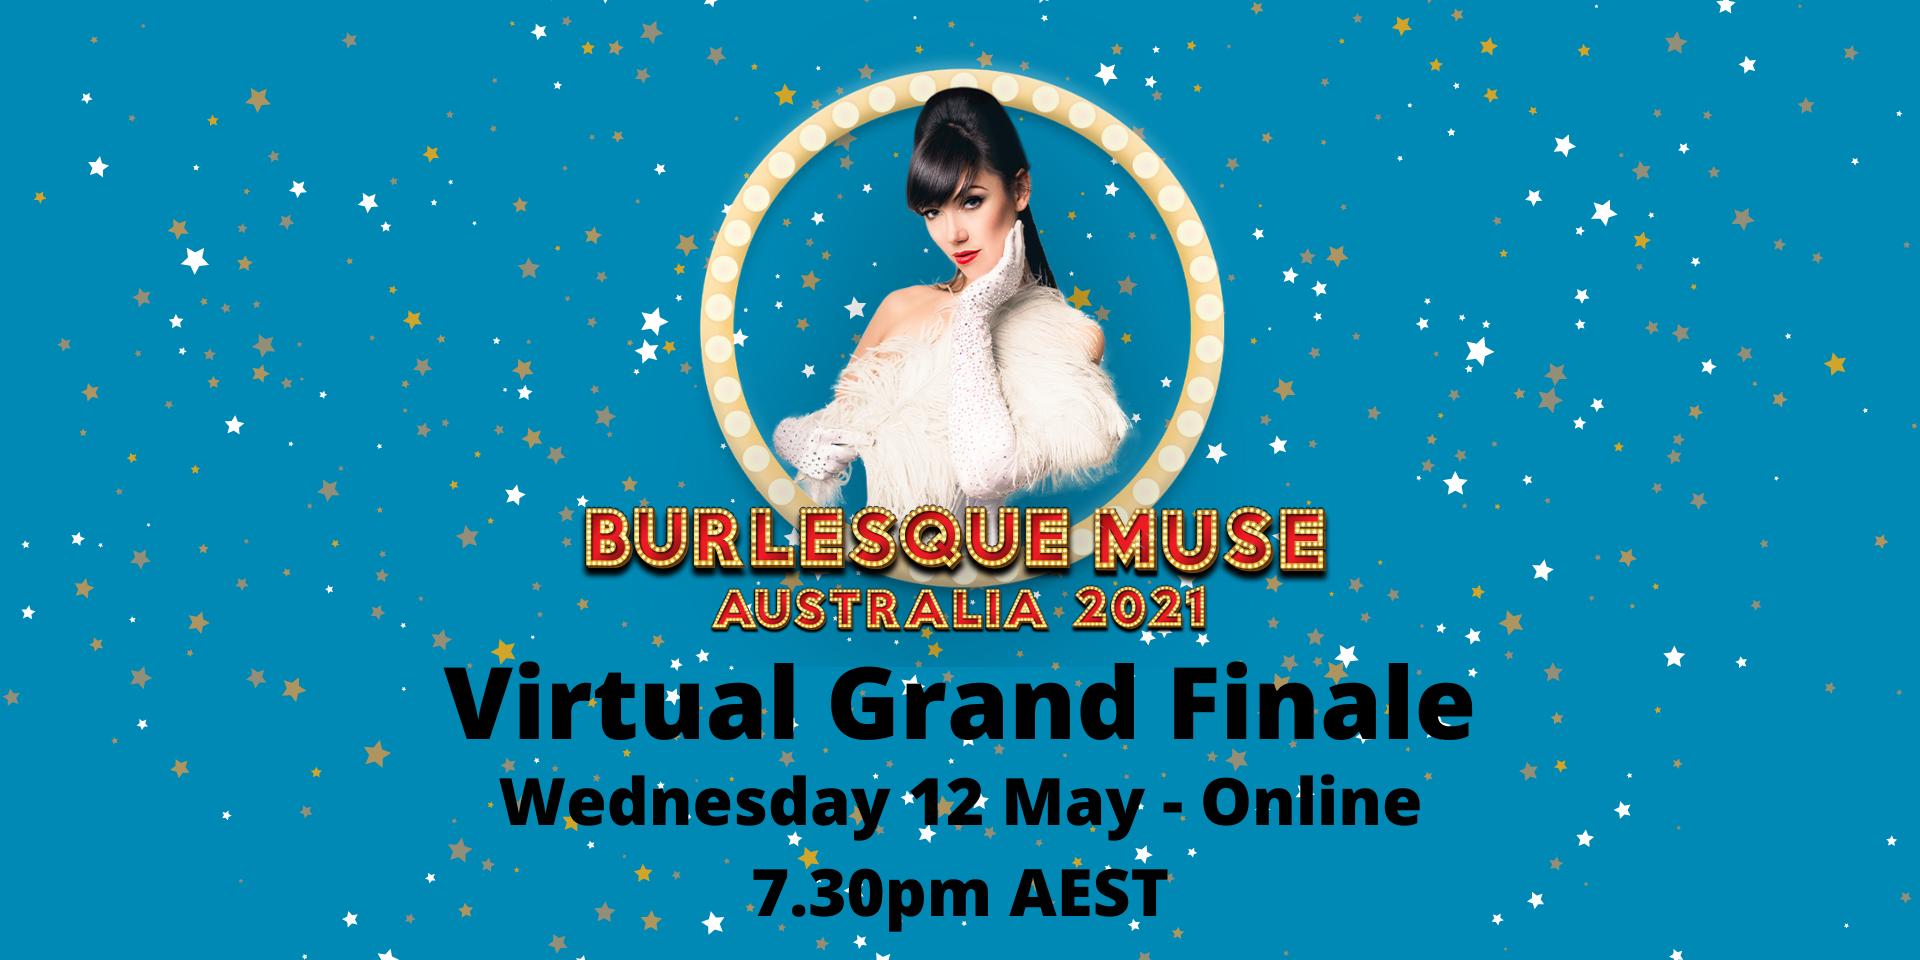 Burlesque Idol Australia - Muse 2021 Grand Finale